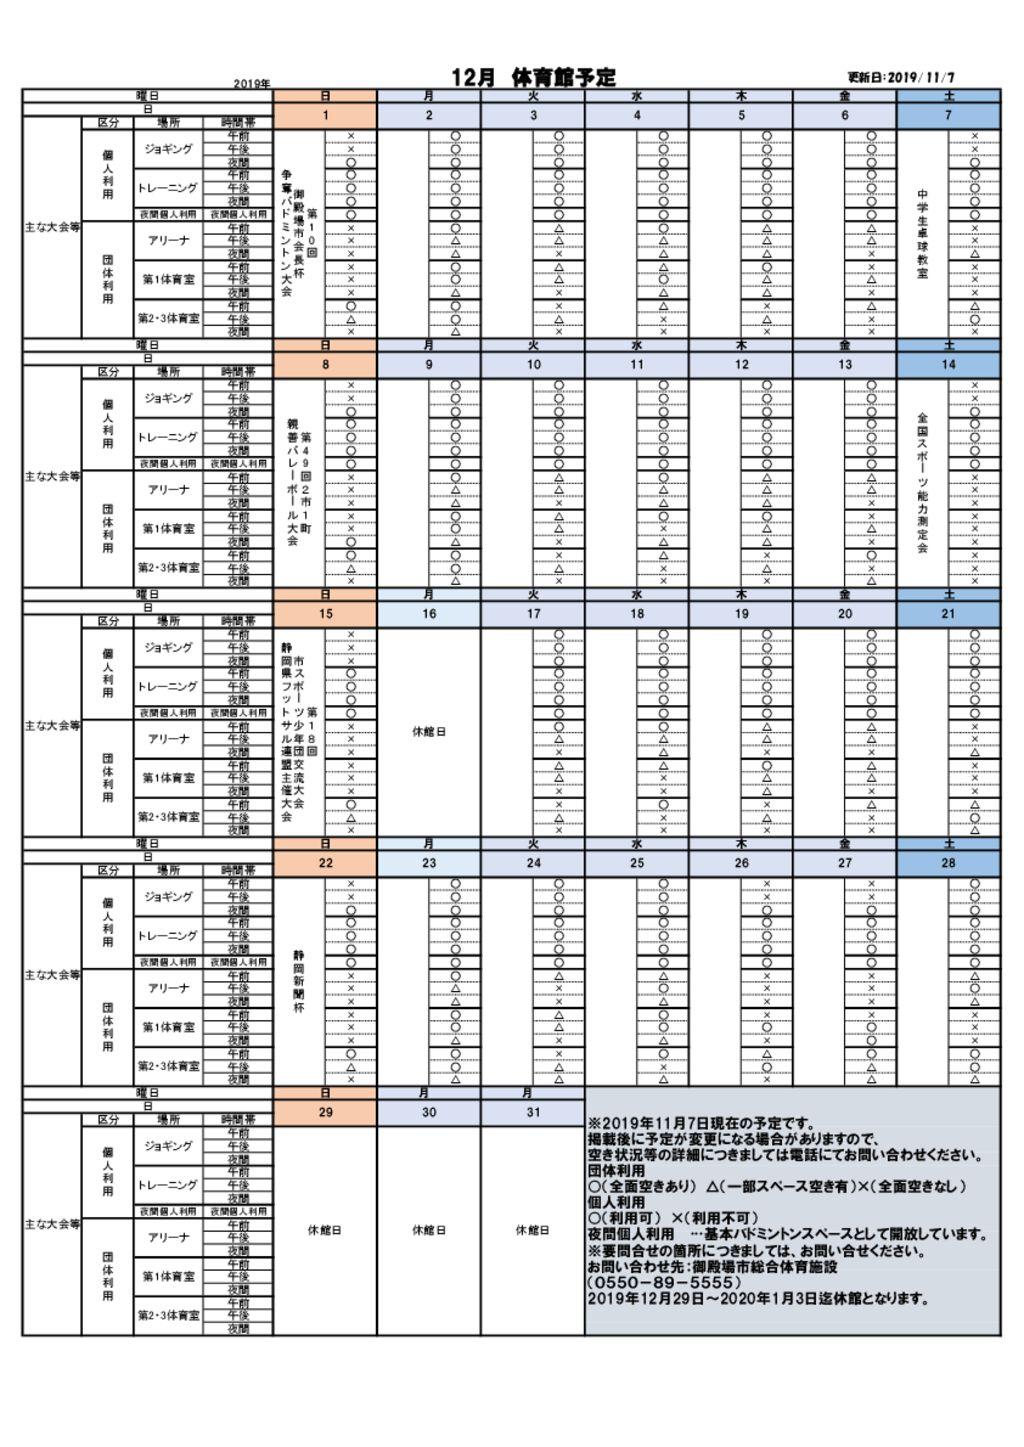 R1.12月体育館予定表のサムネイル